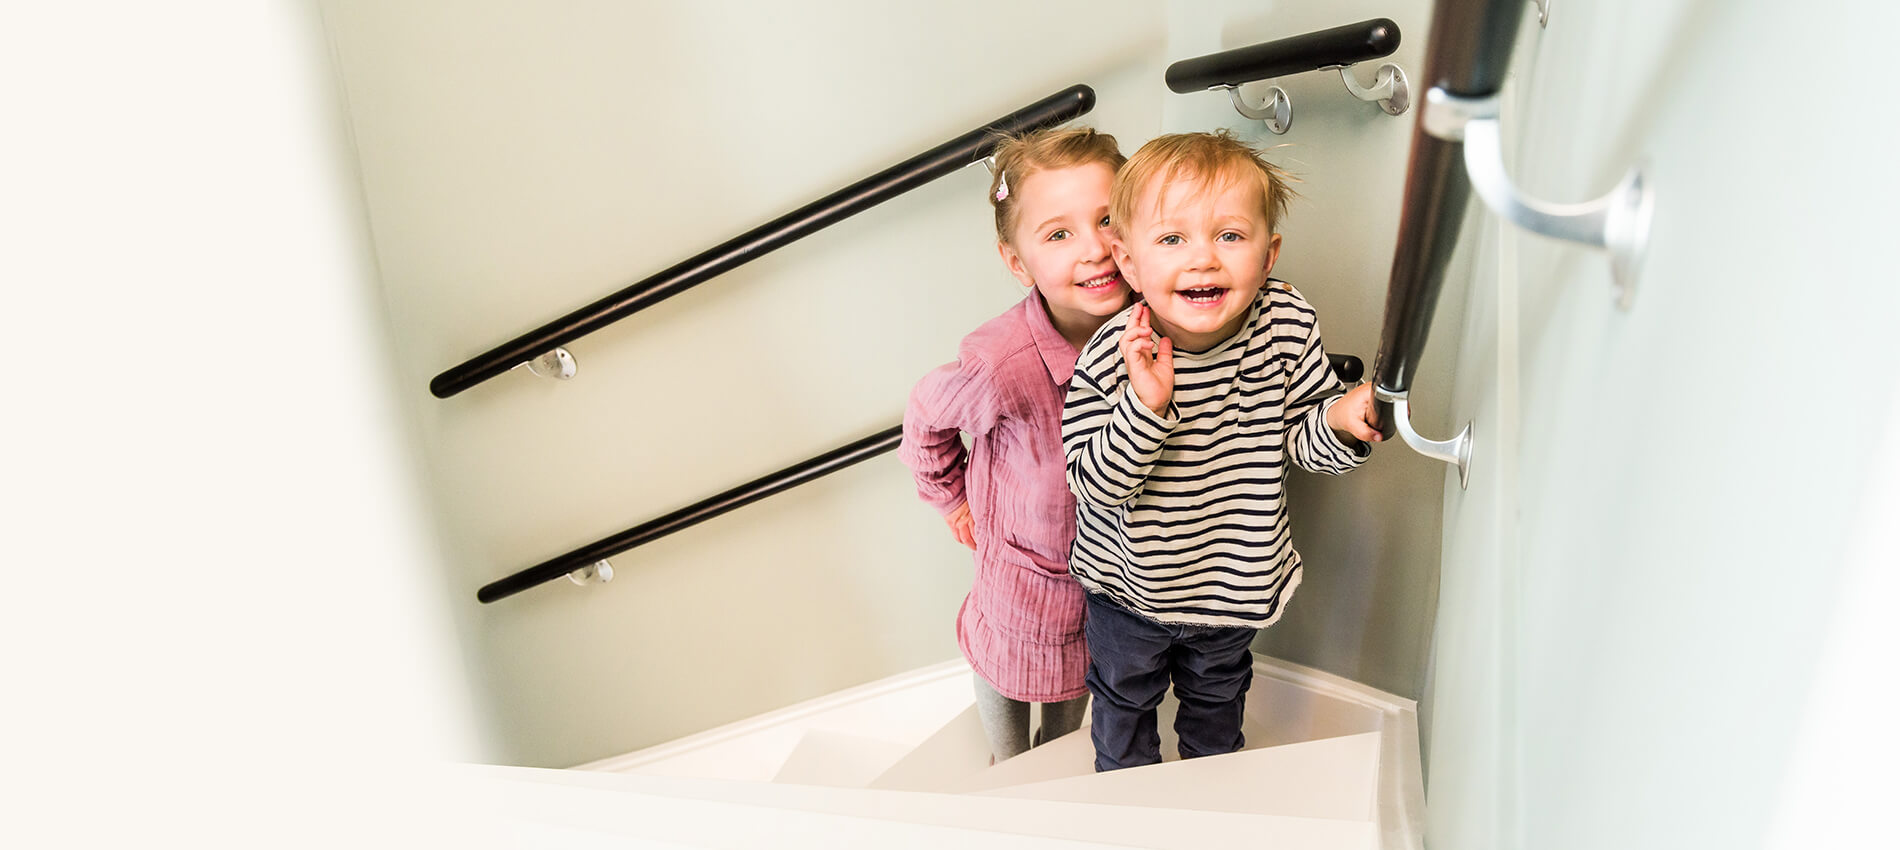 kindertrapleuning-veilig-duurzaam-10